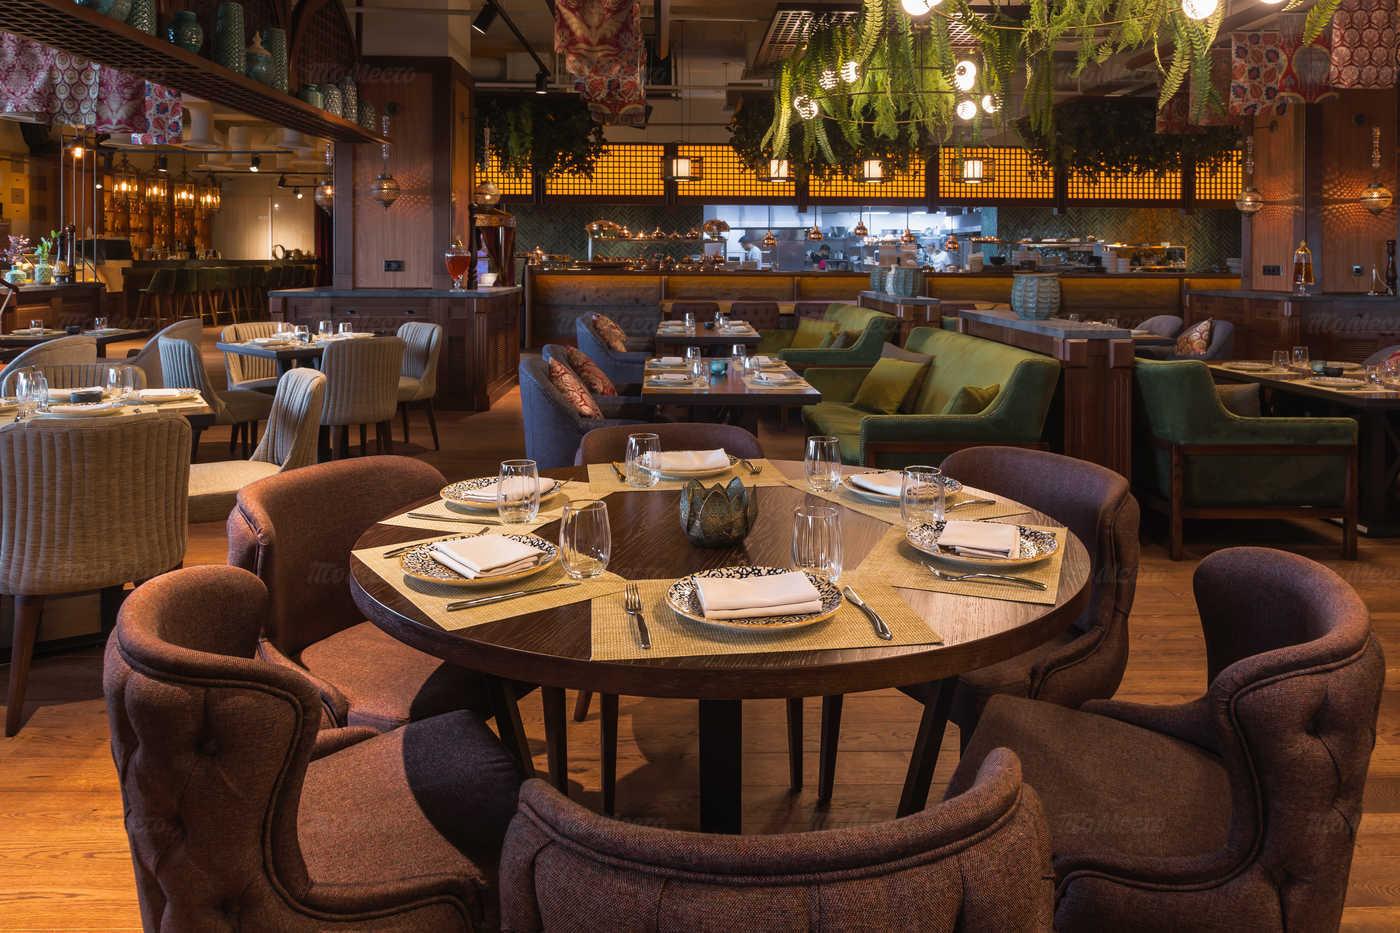 Ресторан Левантин (Levantine) на Новинском бульваре фото 9